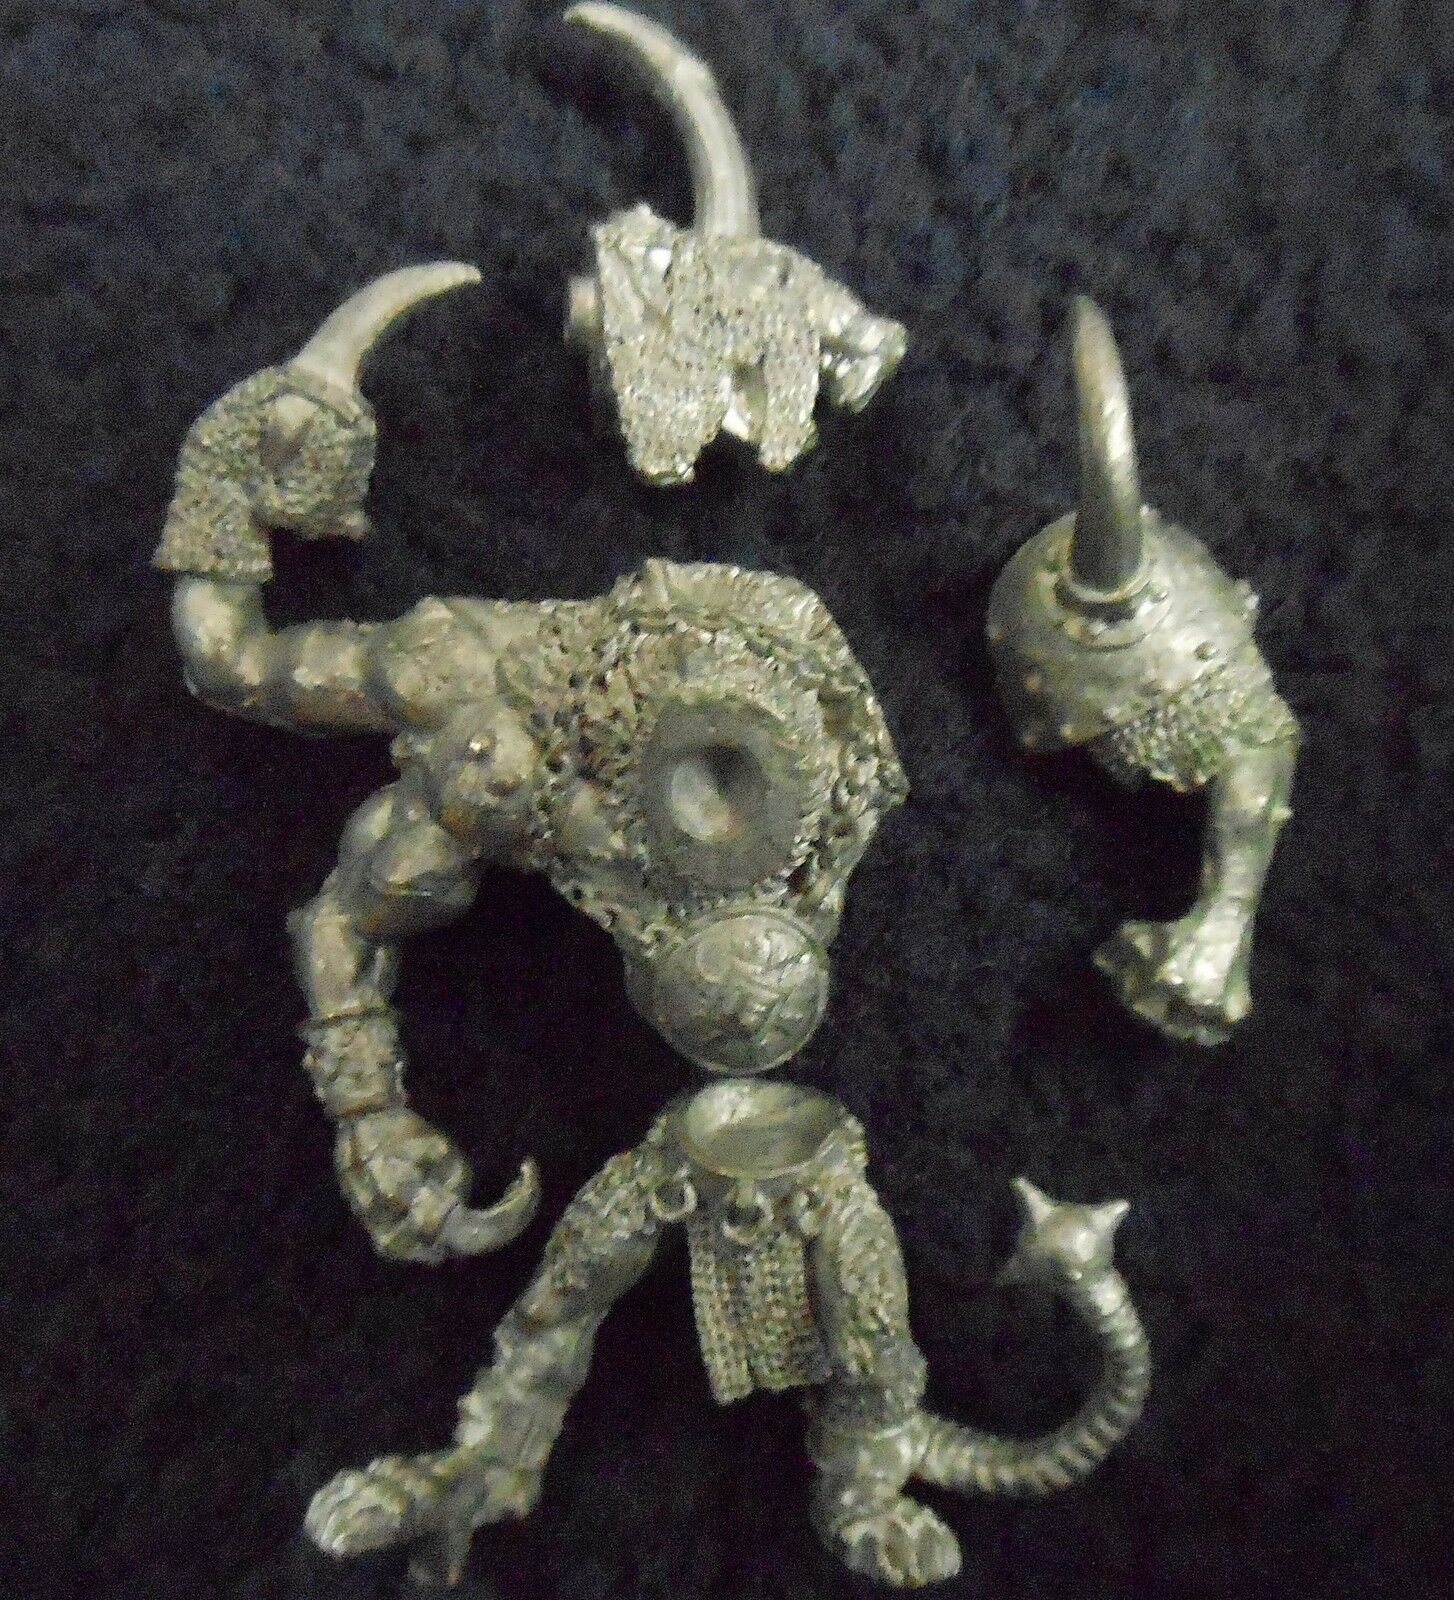 1993 Skaven Boneripper Mutant Rat Ogre Chaos Ratmen Citadel Warhammer Ogor Beast